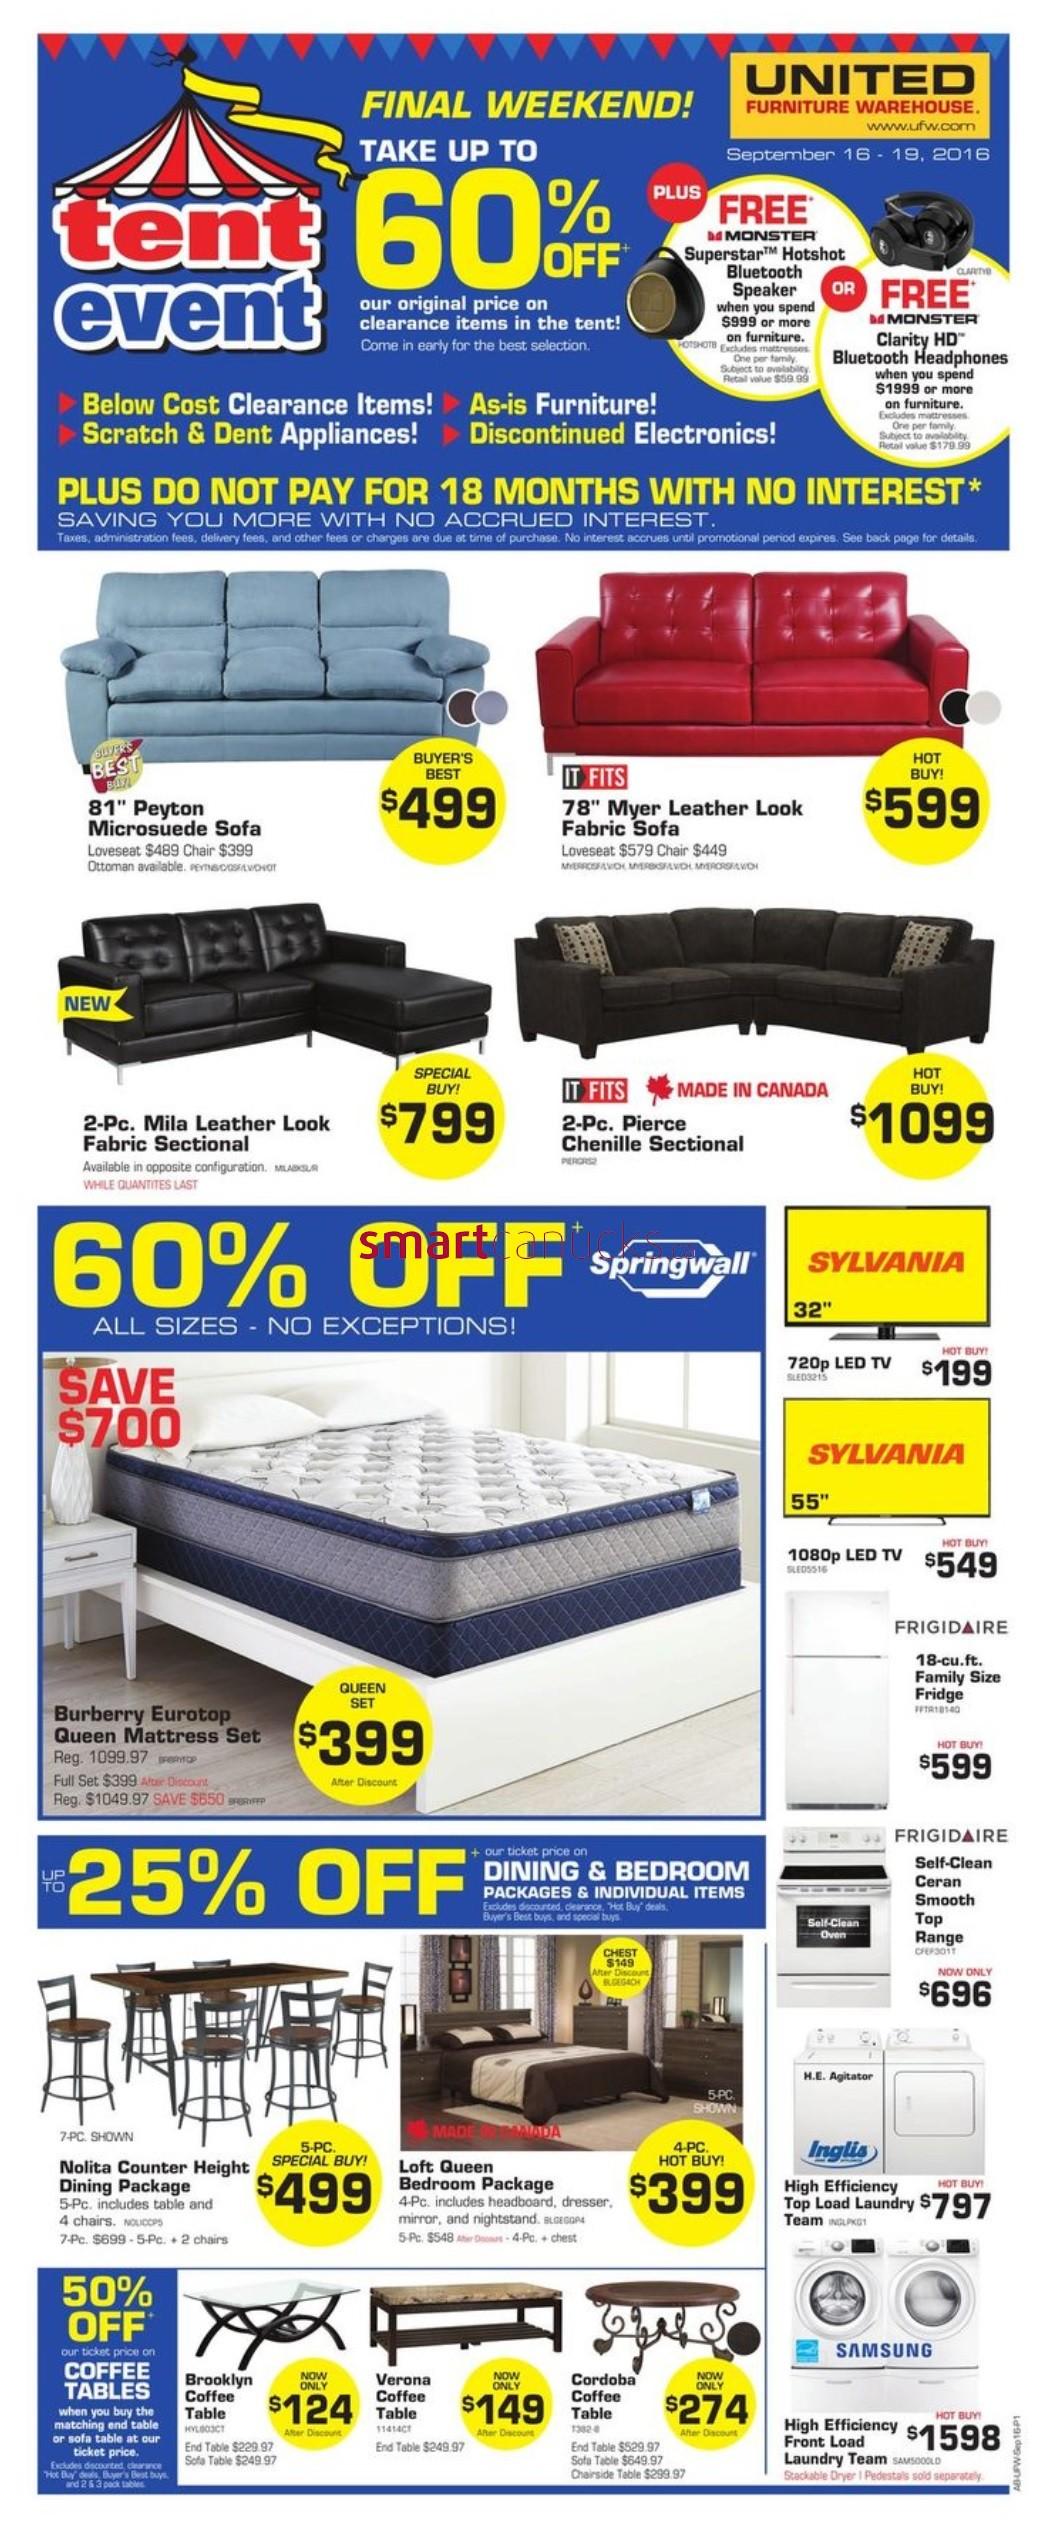 united furniture warehouse flyer september 16 to 19